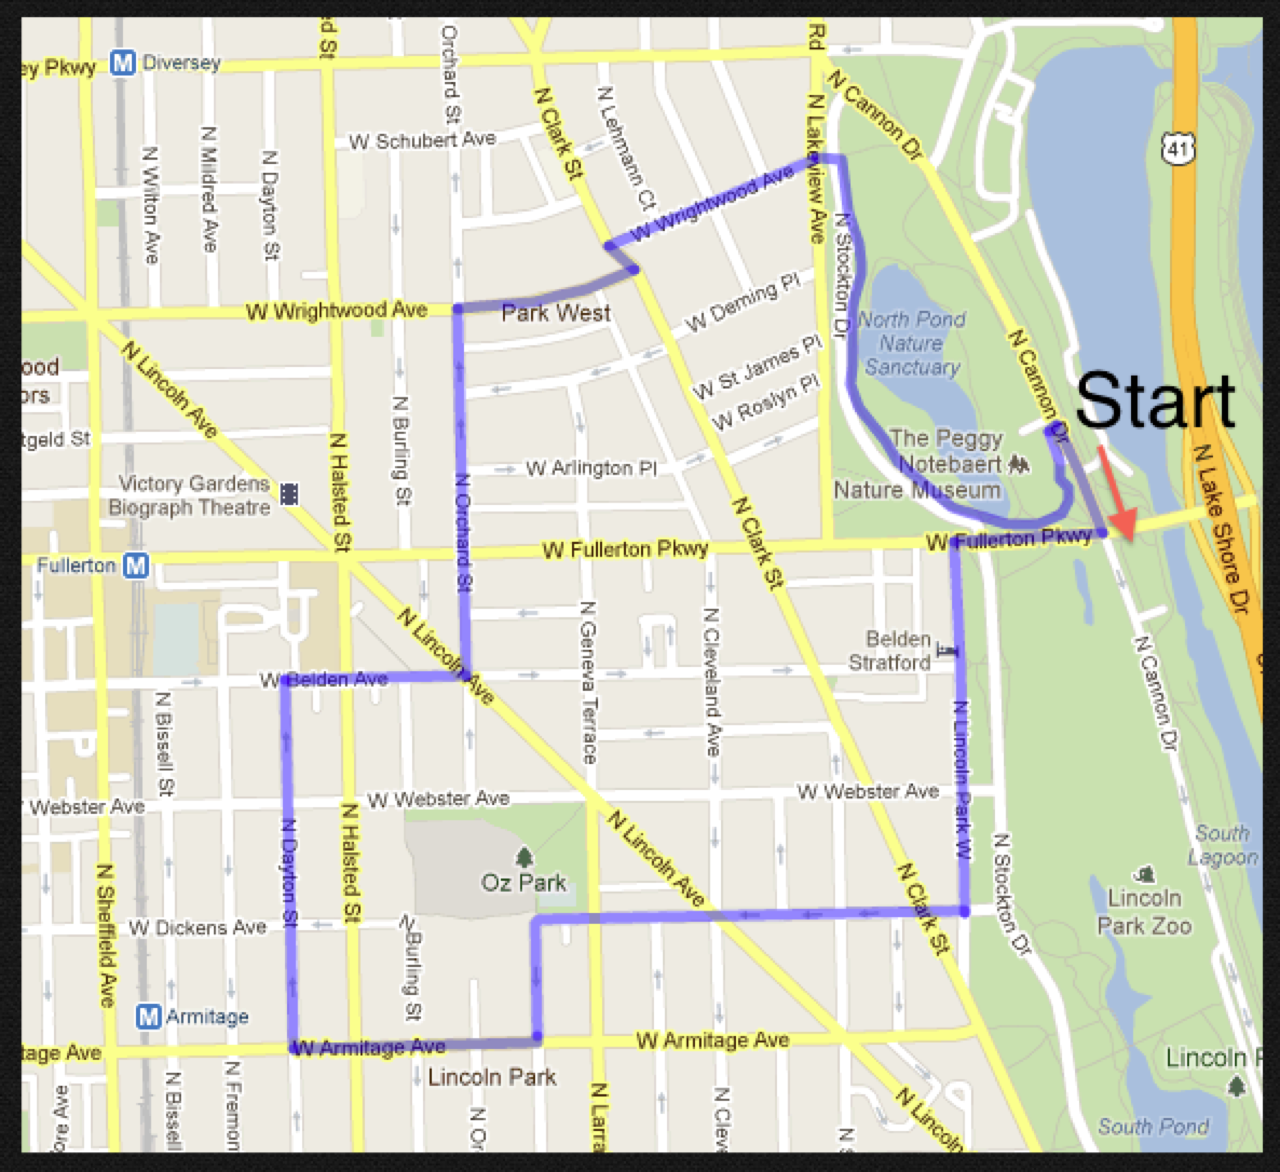 Bike Walk Lincoln Park A Fun Inaugural 43rd Ward Bike Ride